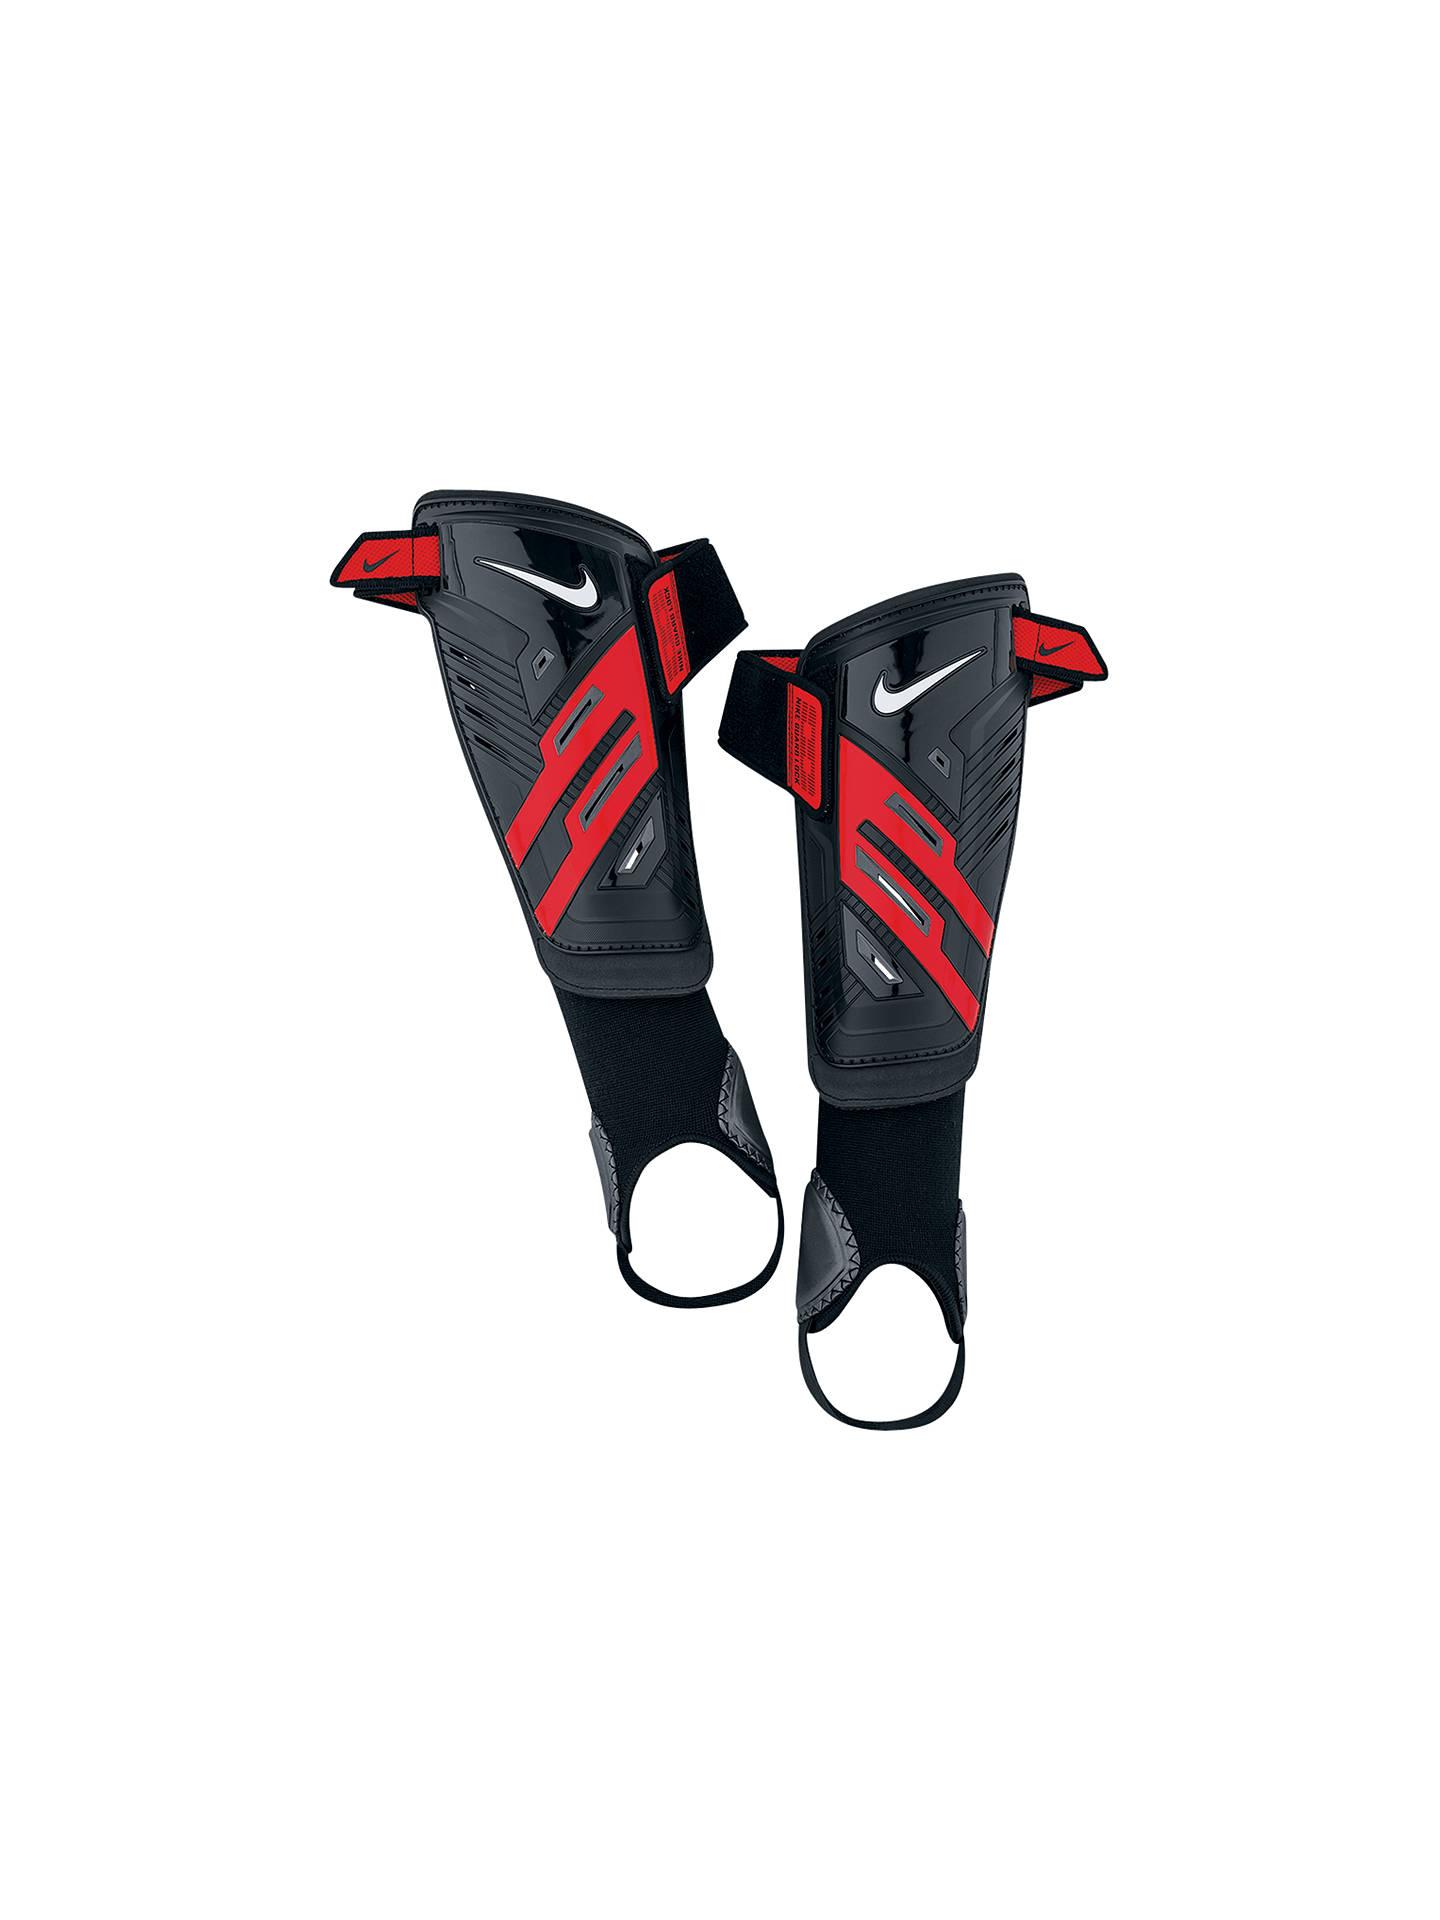 travesura máximo Beca  Nike Protegga Shield Shin Pads, Black/Red at John Lewis & Partners